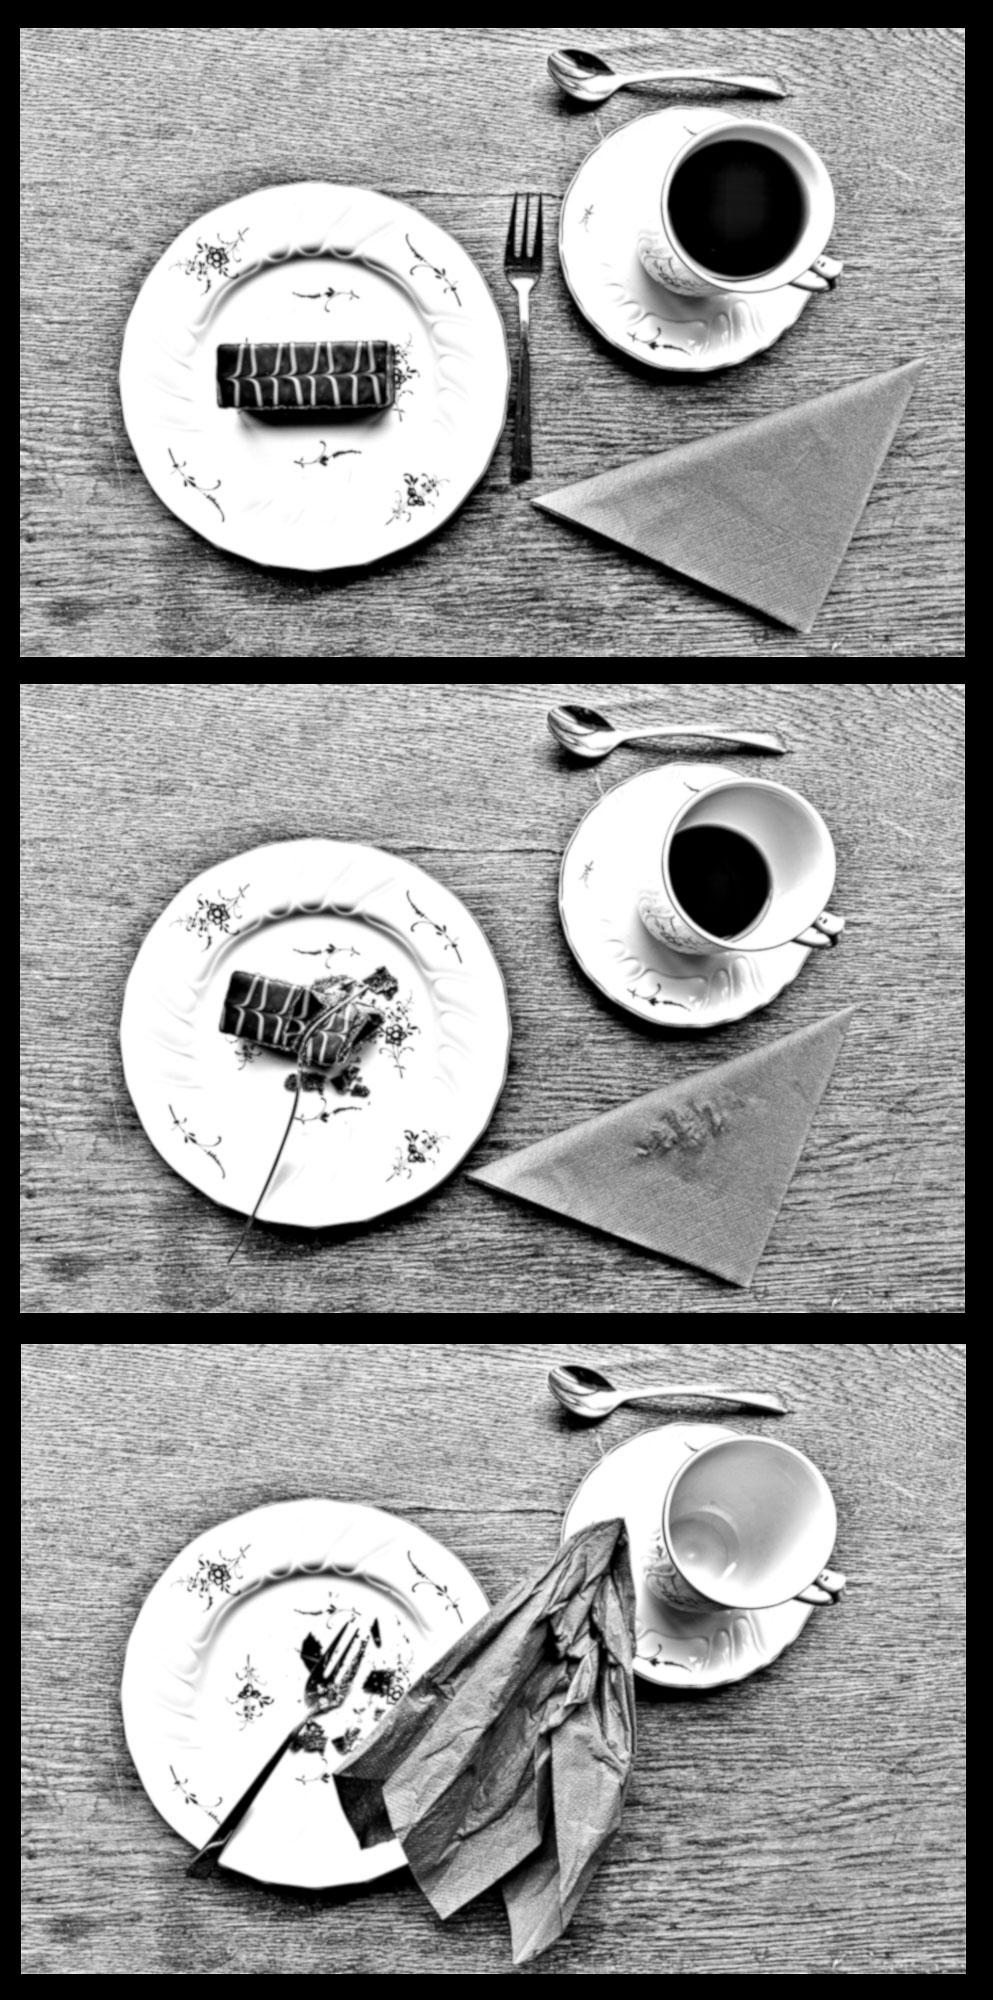 Neckepin / Kaffee